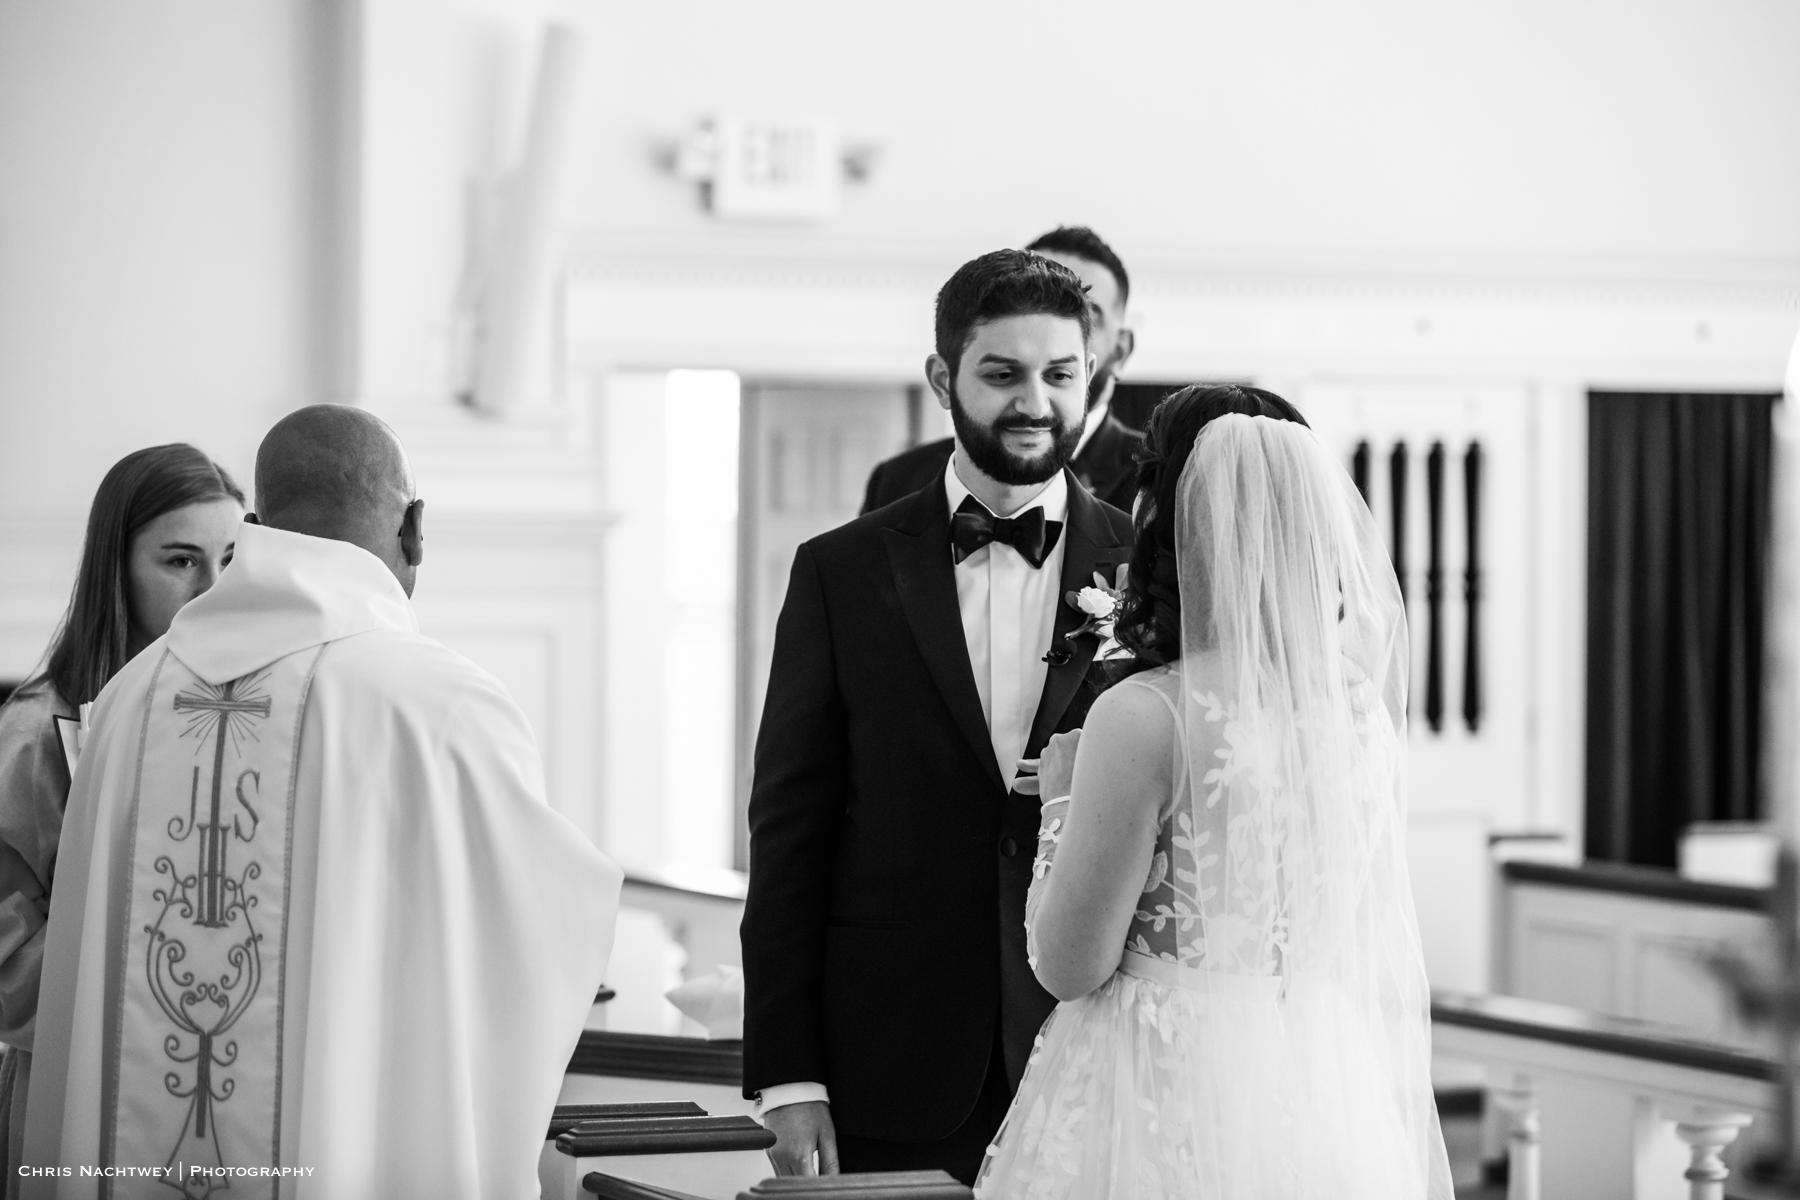 winter-branford-house-wedding-photos-groton-ct-chris-nachtwey-photography-2019-16.jpg